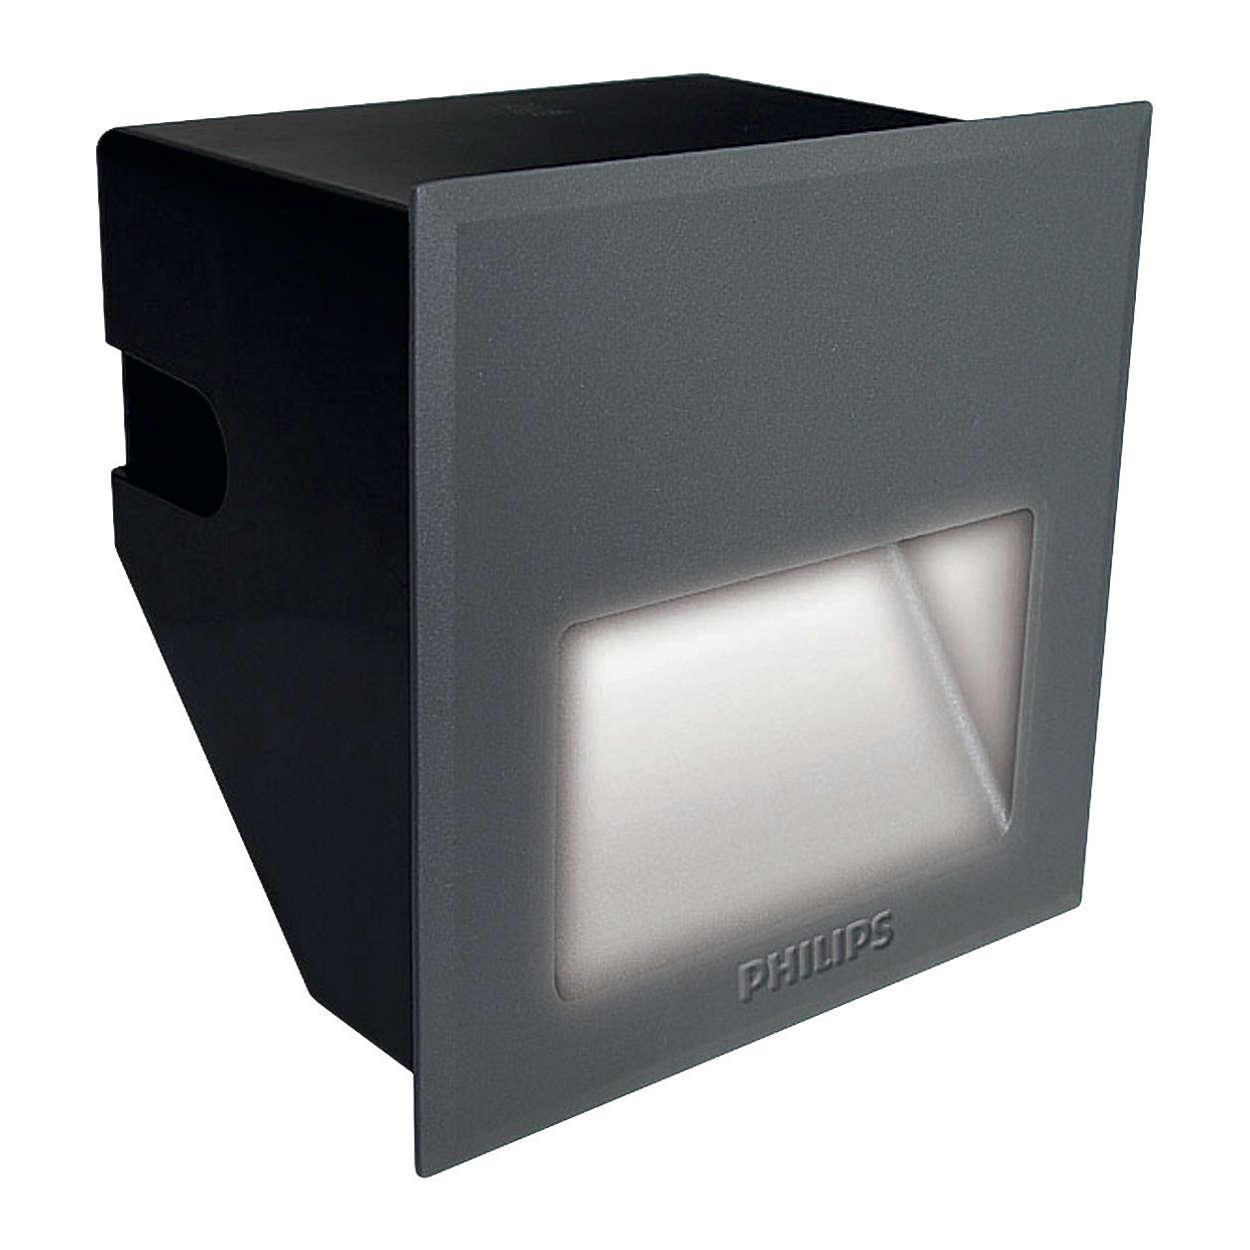 LED Step-Light BWG150 – Reliable landscape lighting for harmonious city living